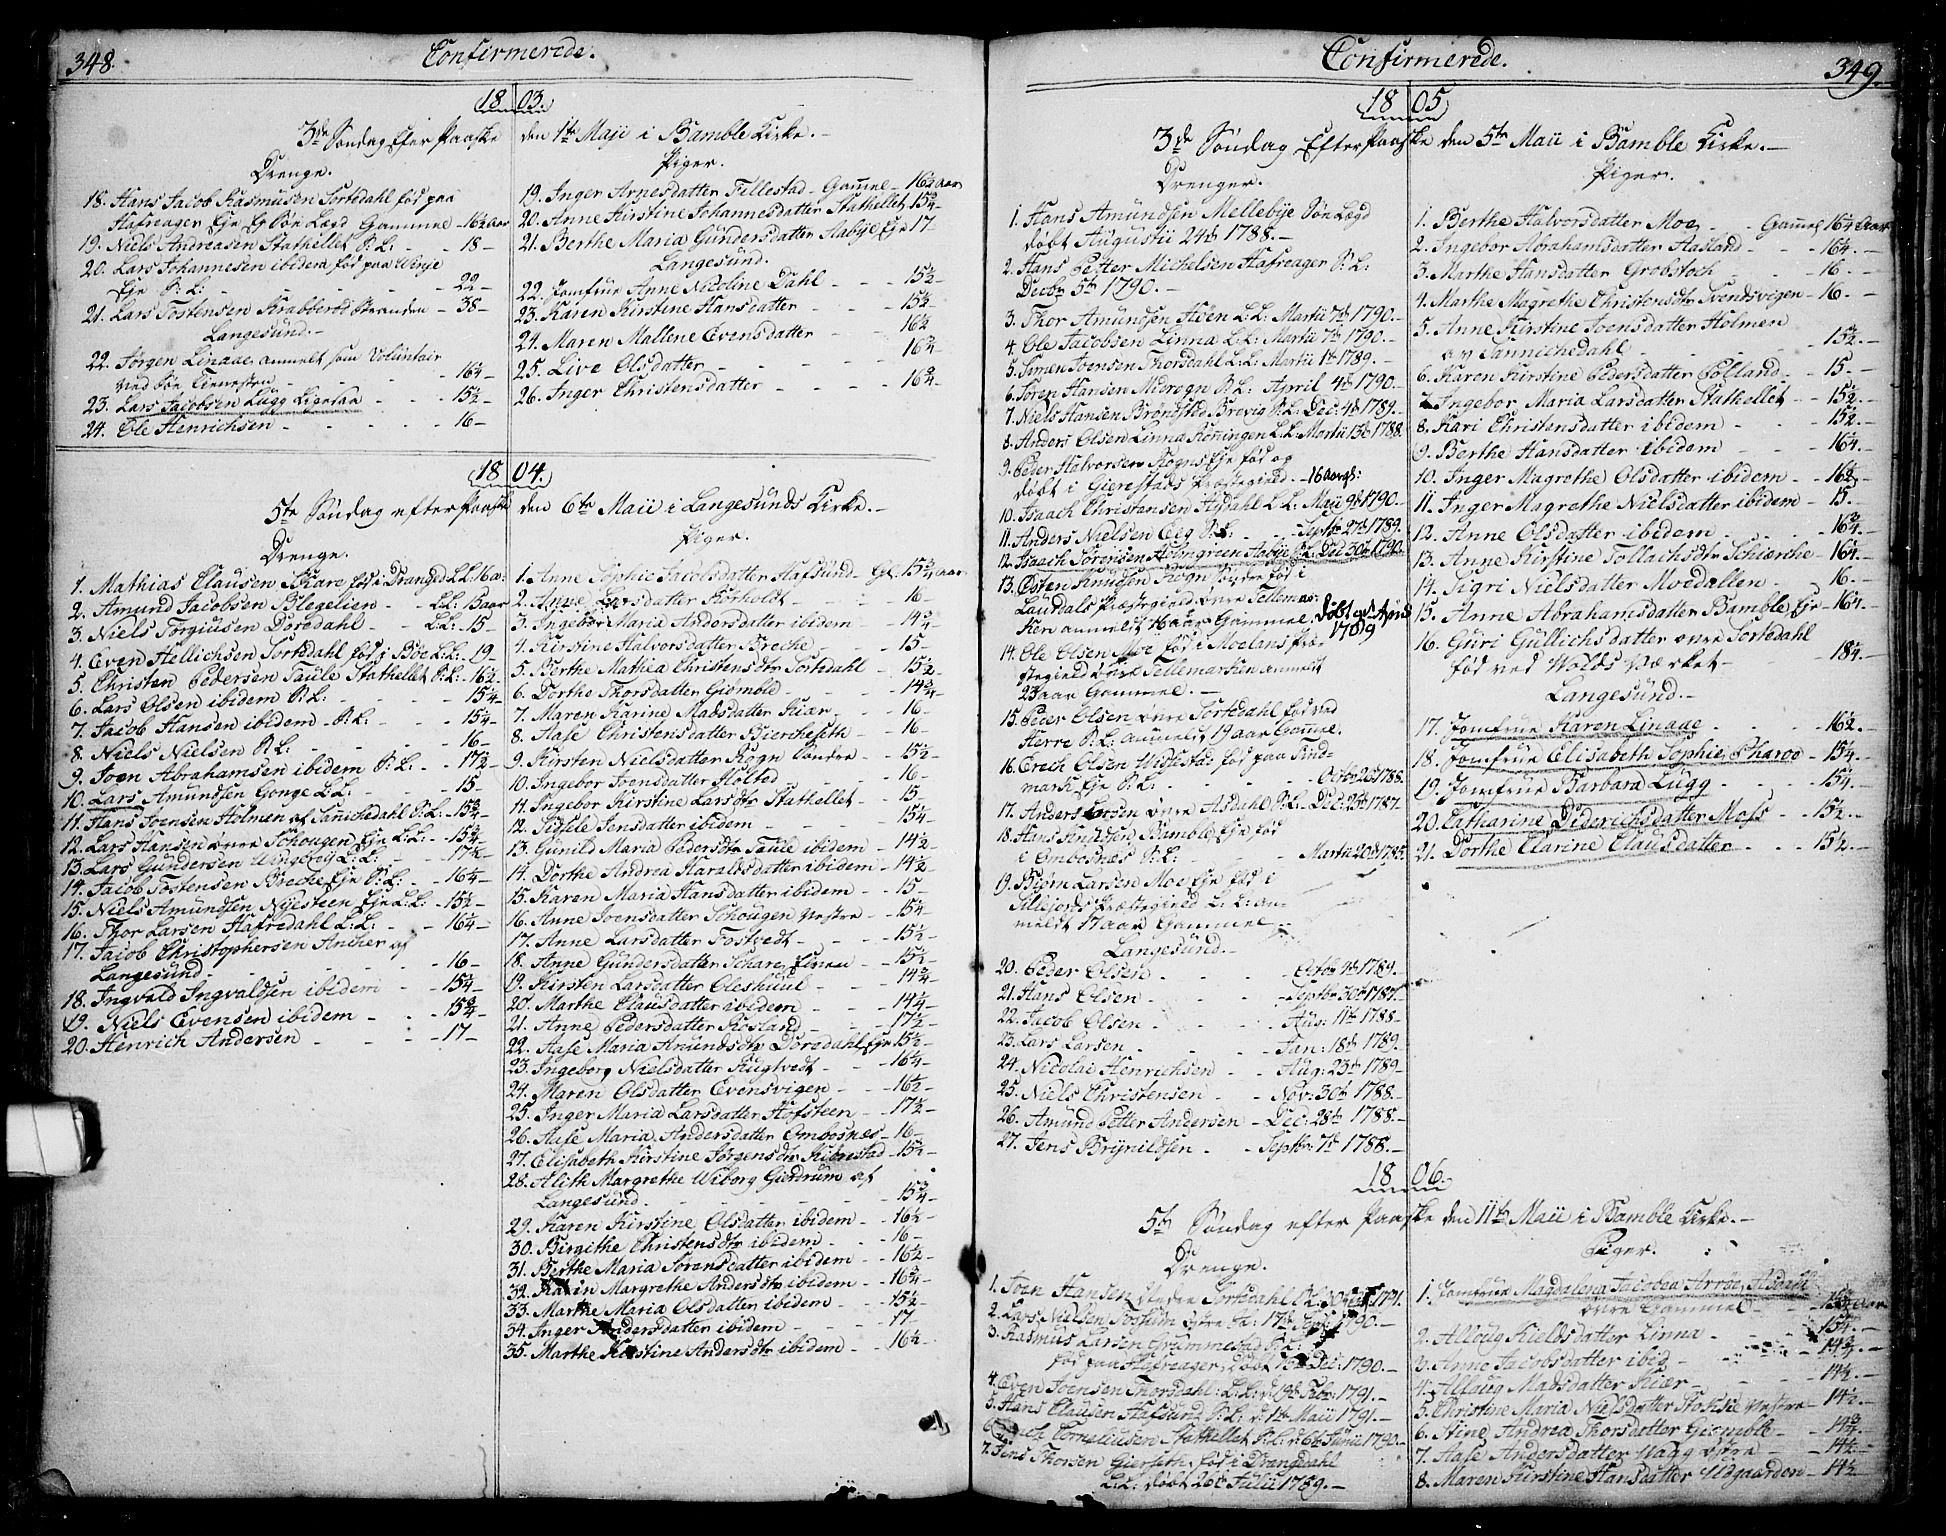 SAKO, Bamble kirkebøker, F/Fa/L0002: Ministerialbok nr. I 2, 1775-1814, s. 348-349